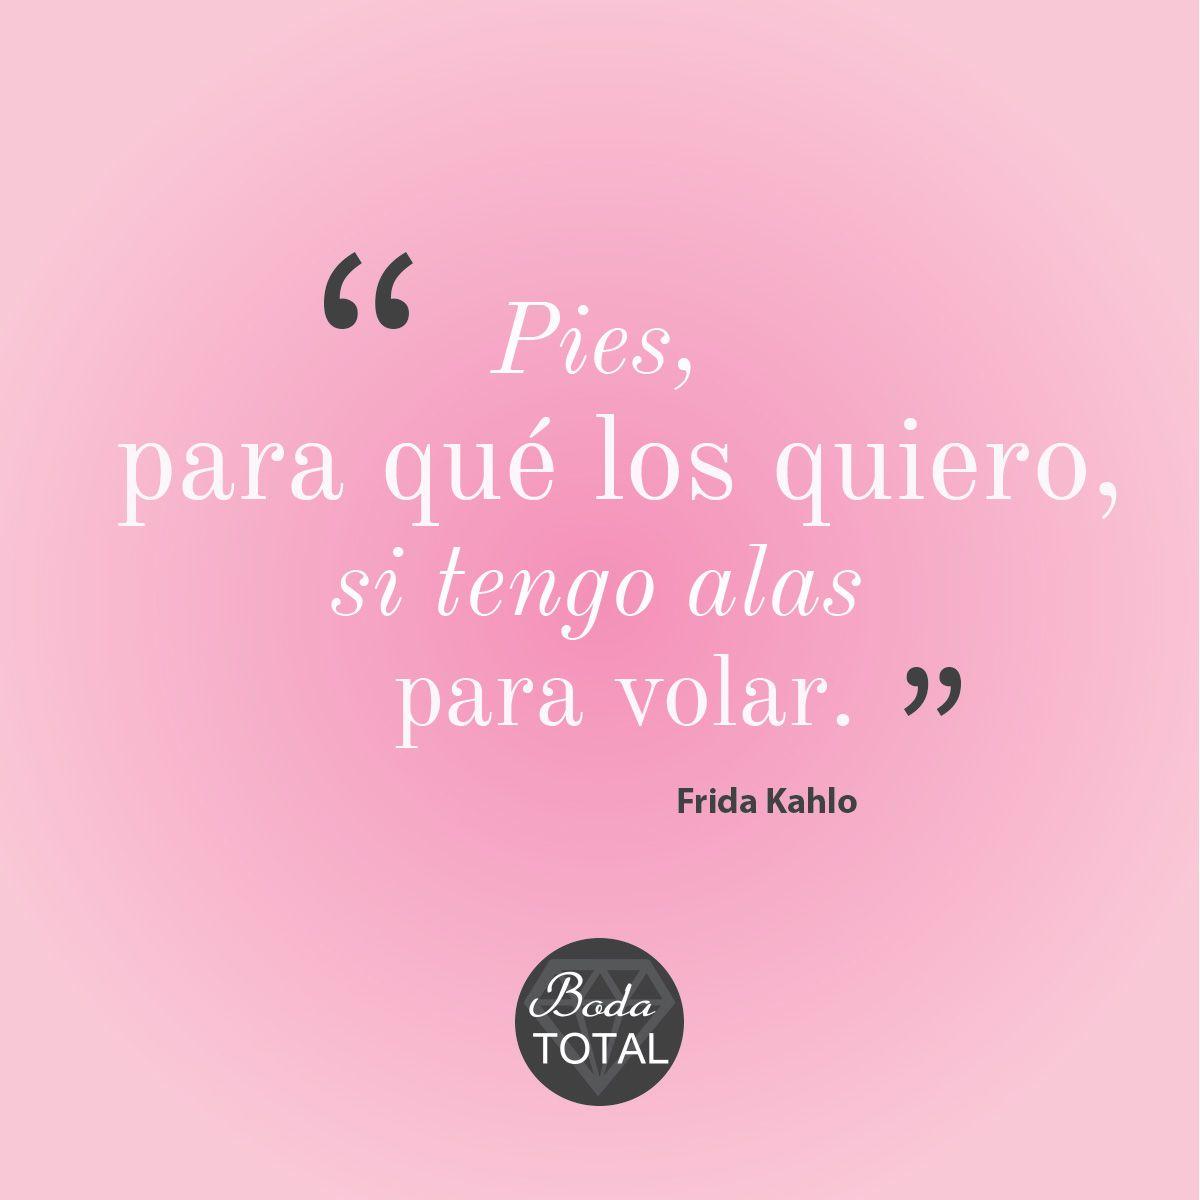 #FridaKahlo #FilosofiaBodaTotal